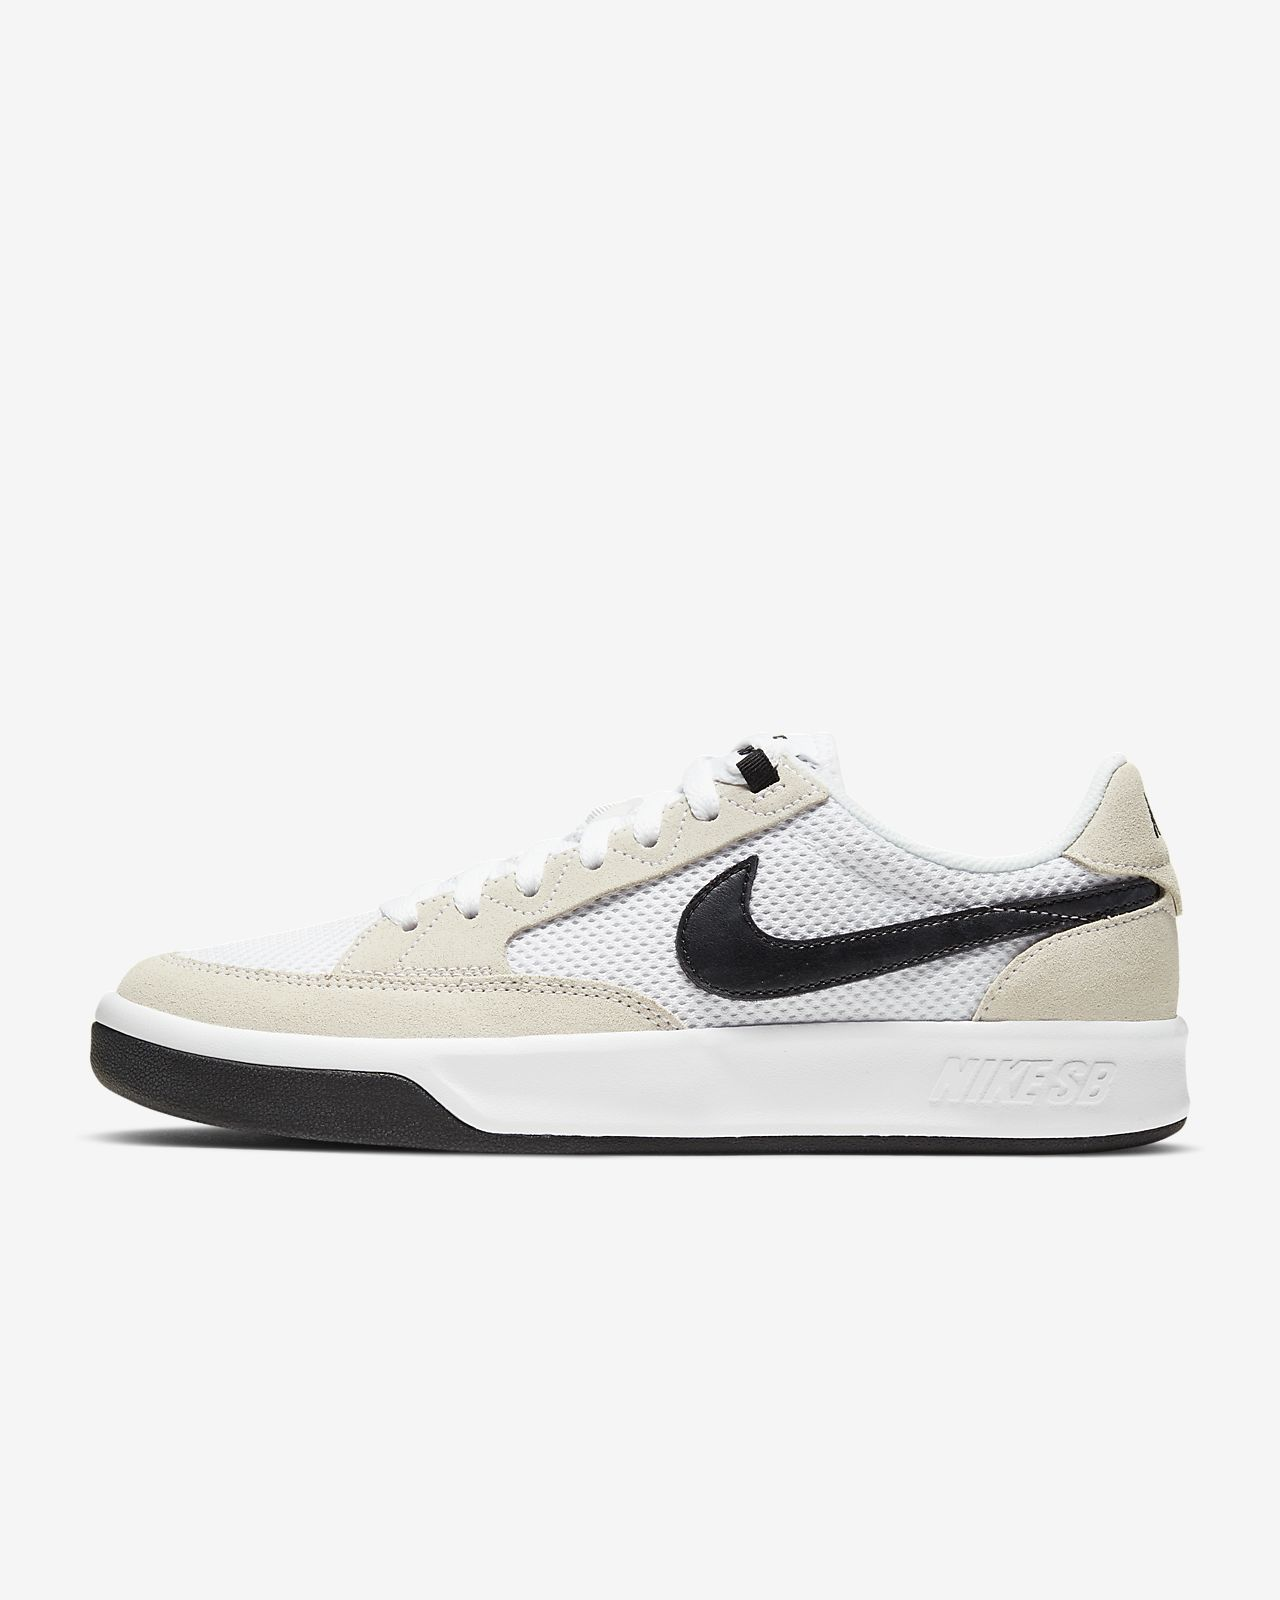 Nike SB Adversary Skateboardschuh